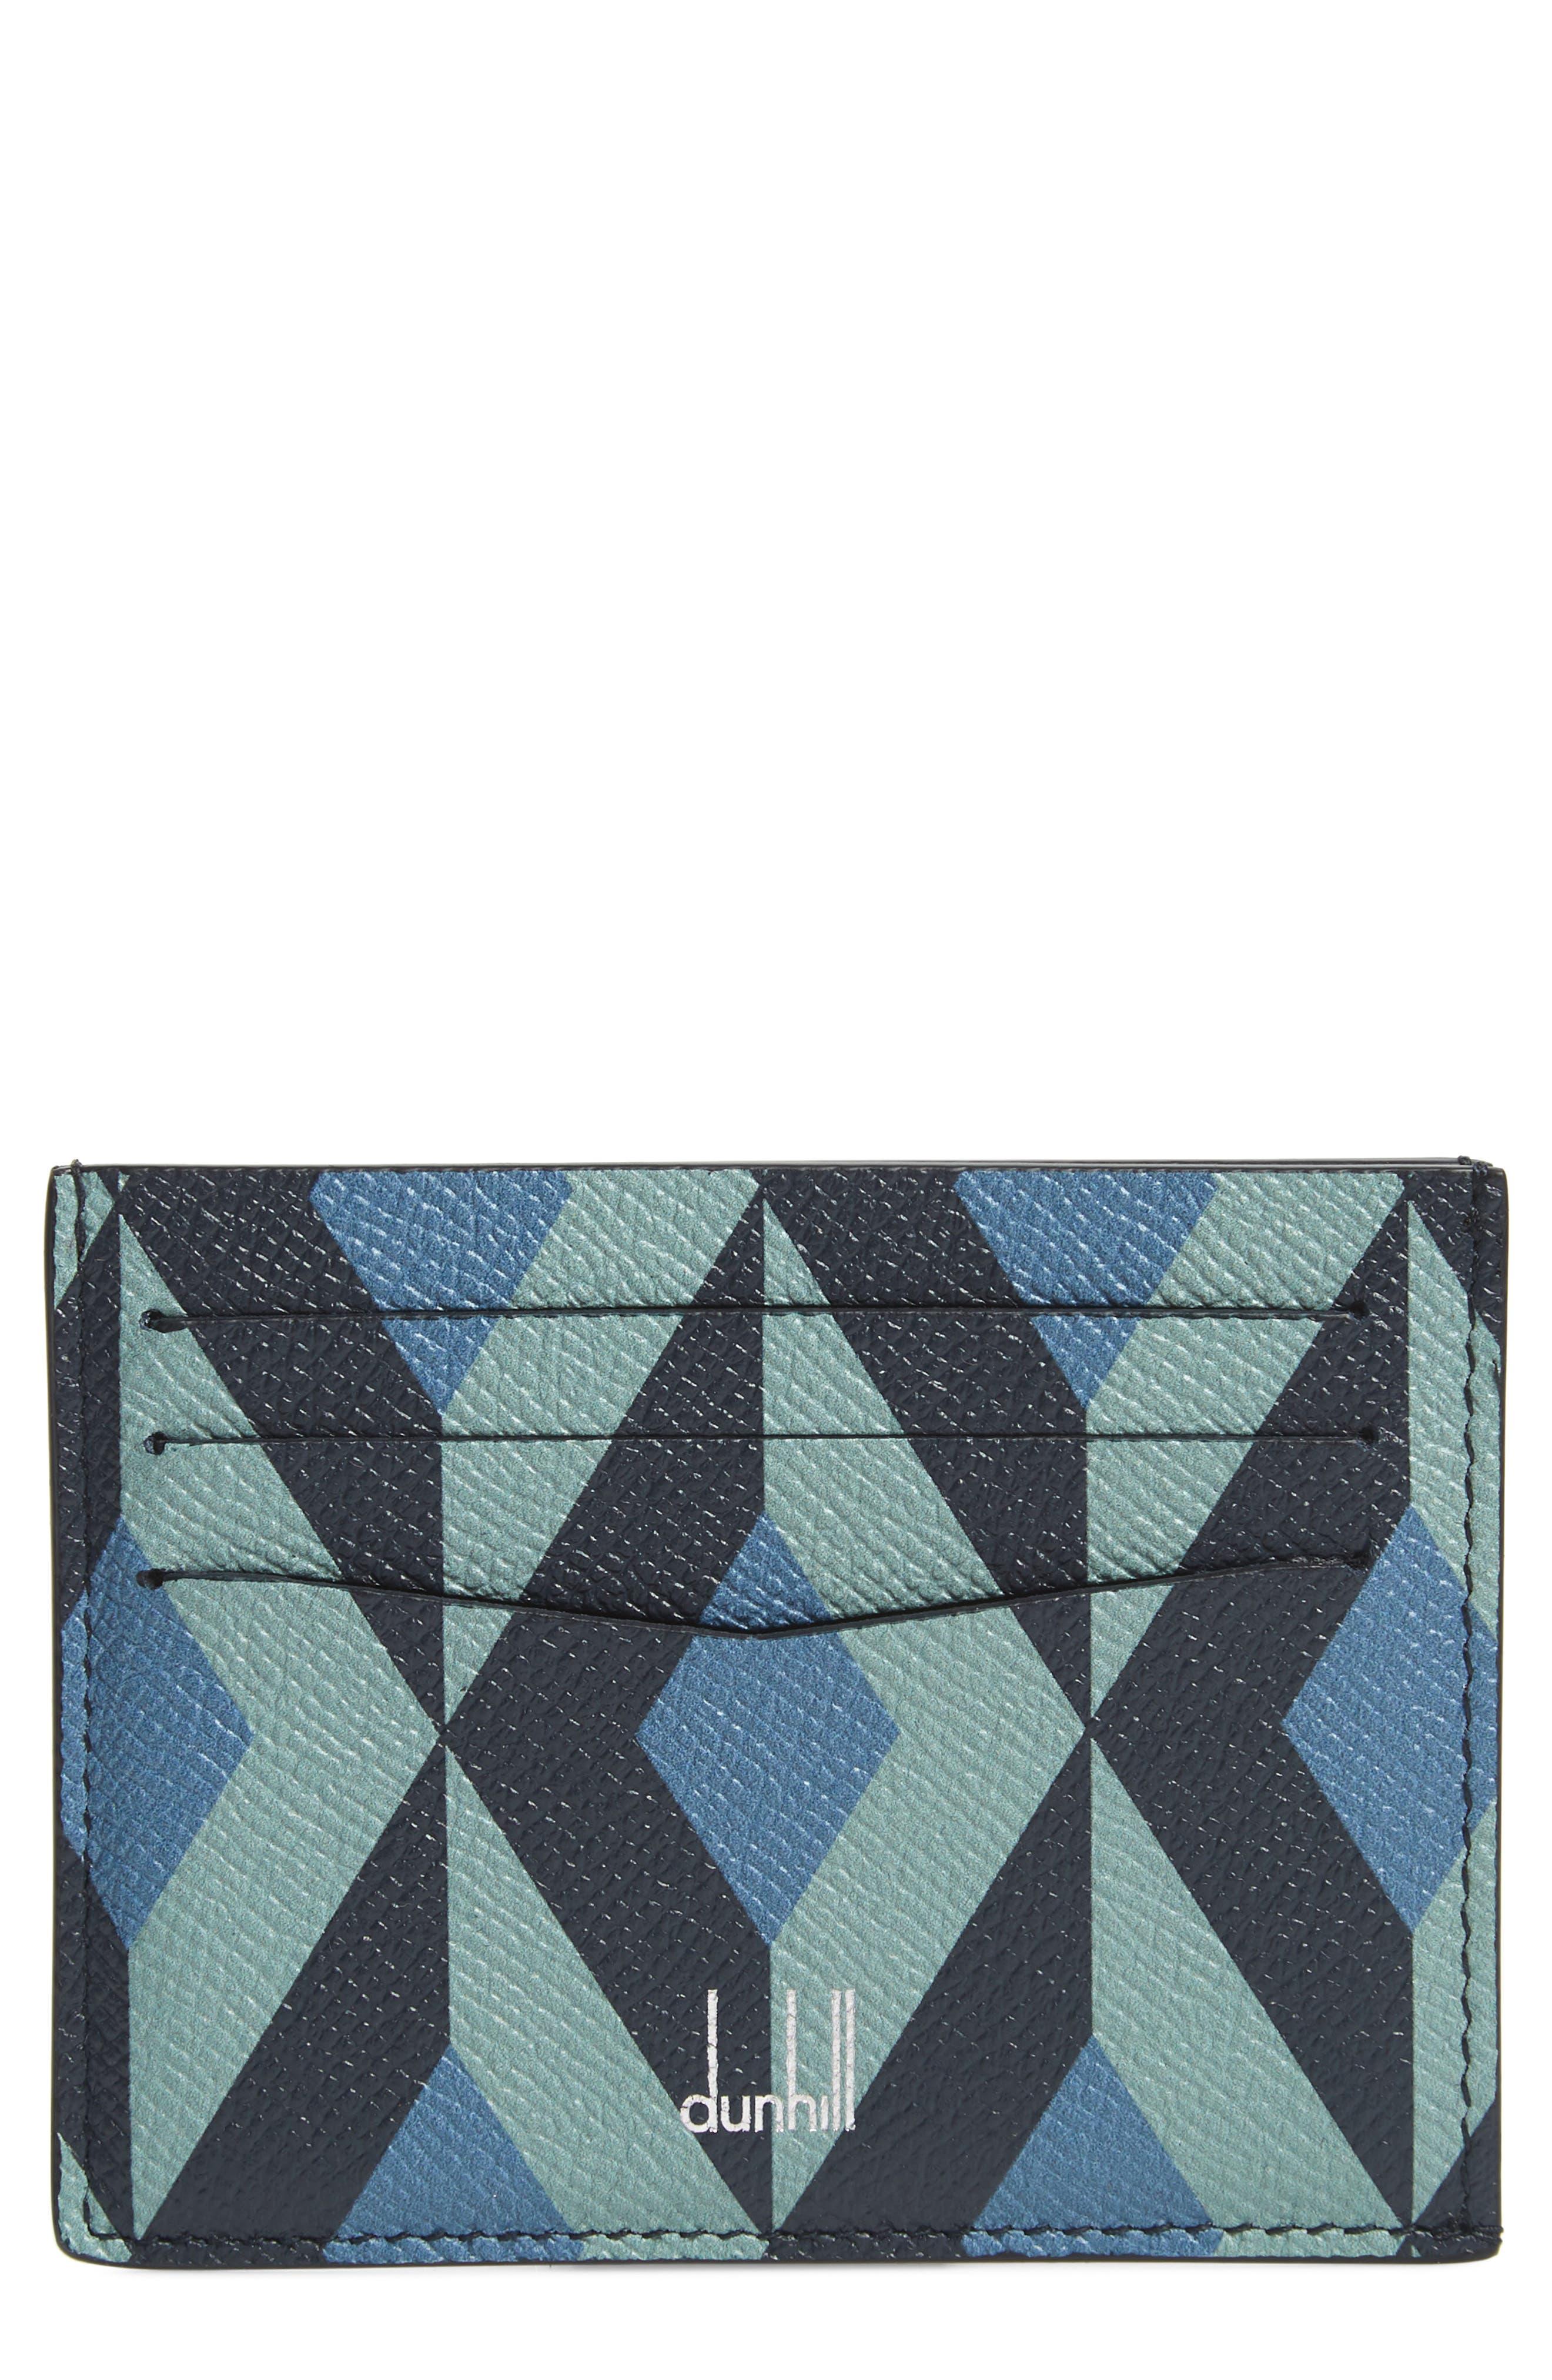 DUNHILL, Cadogan Leather Card Case, Main thumbnail 1, color, STONE BLUE